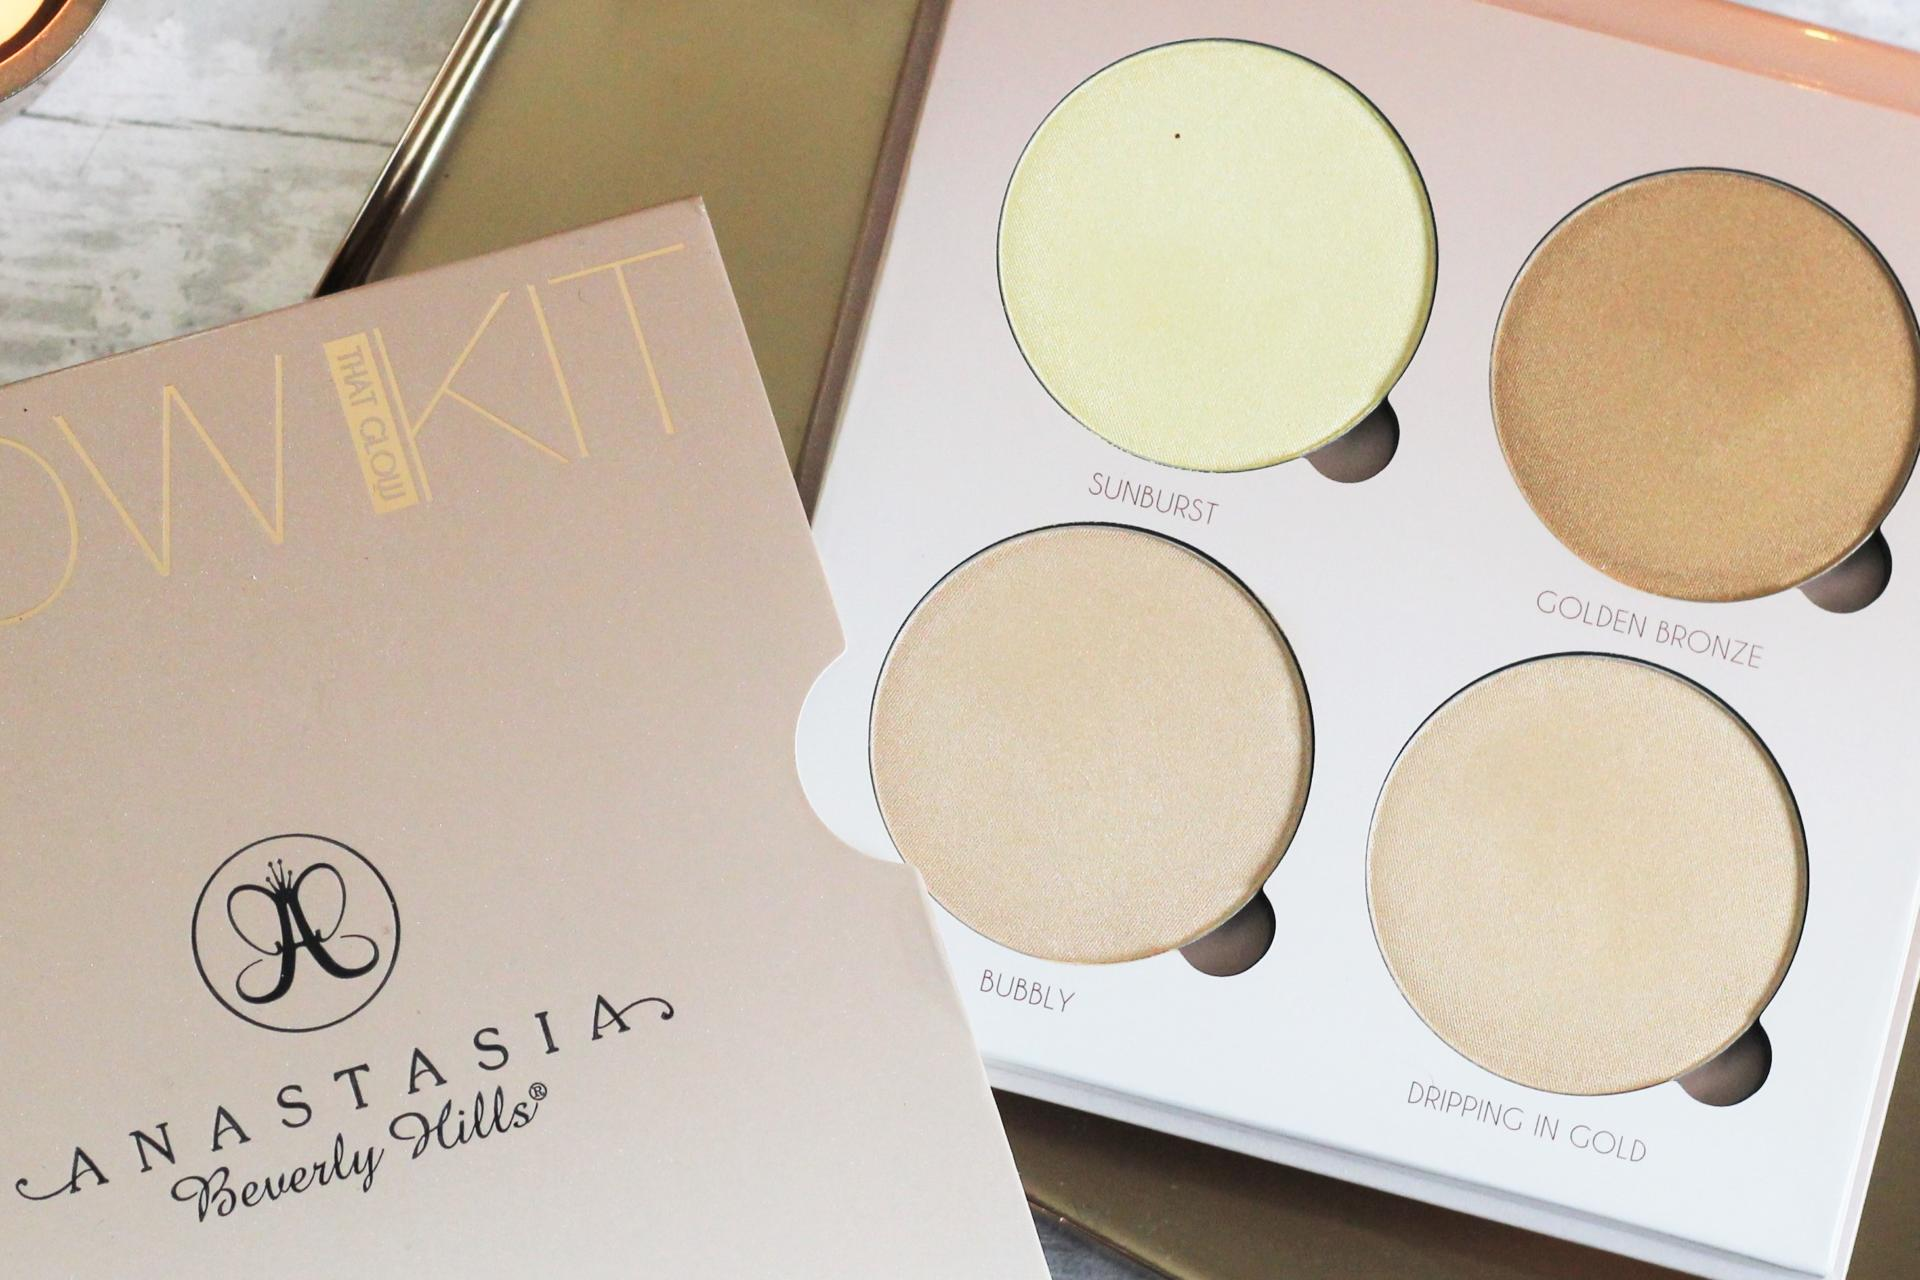 Anastasia Beverly Hills Glow Kit – That Glow